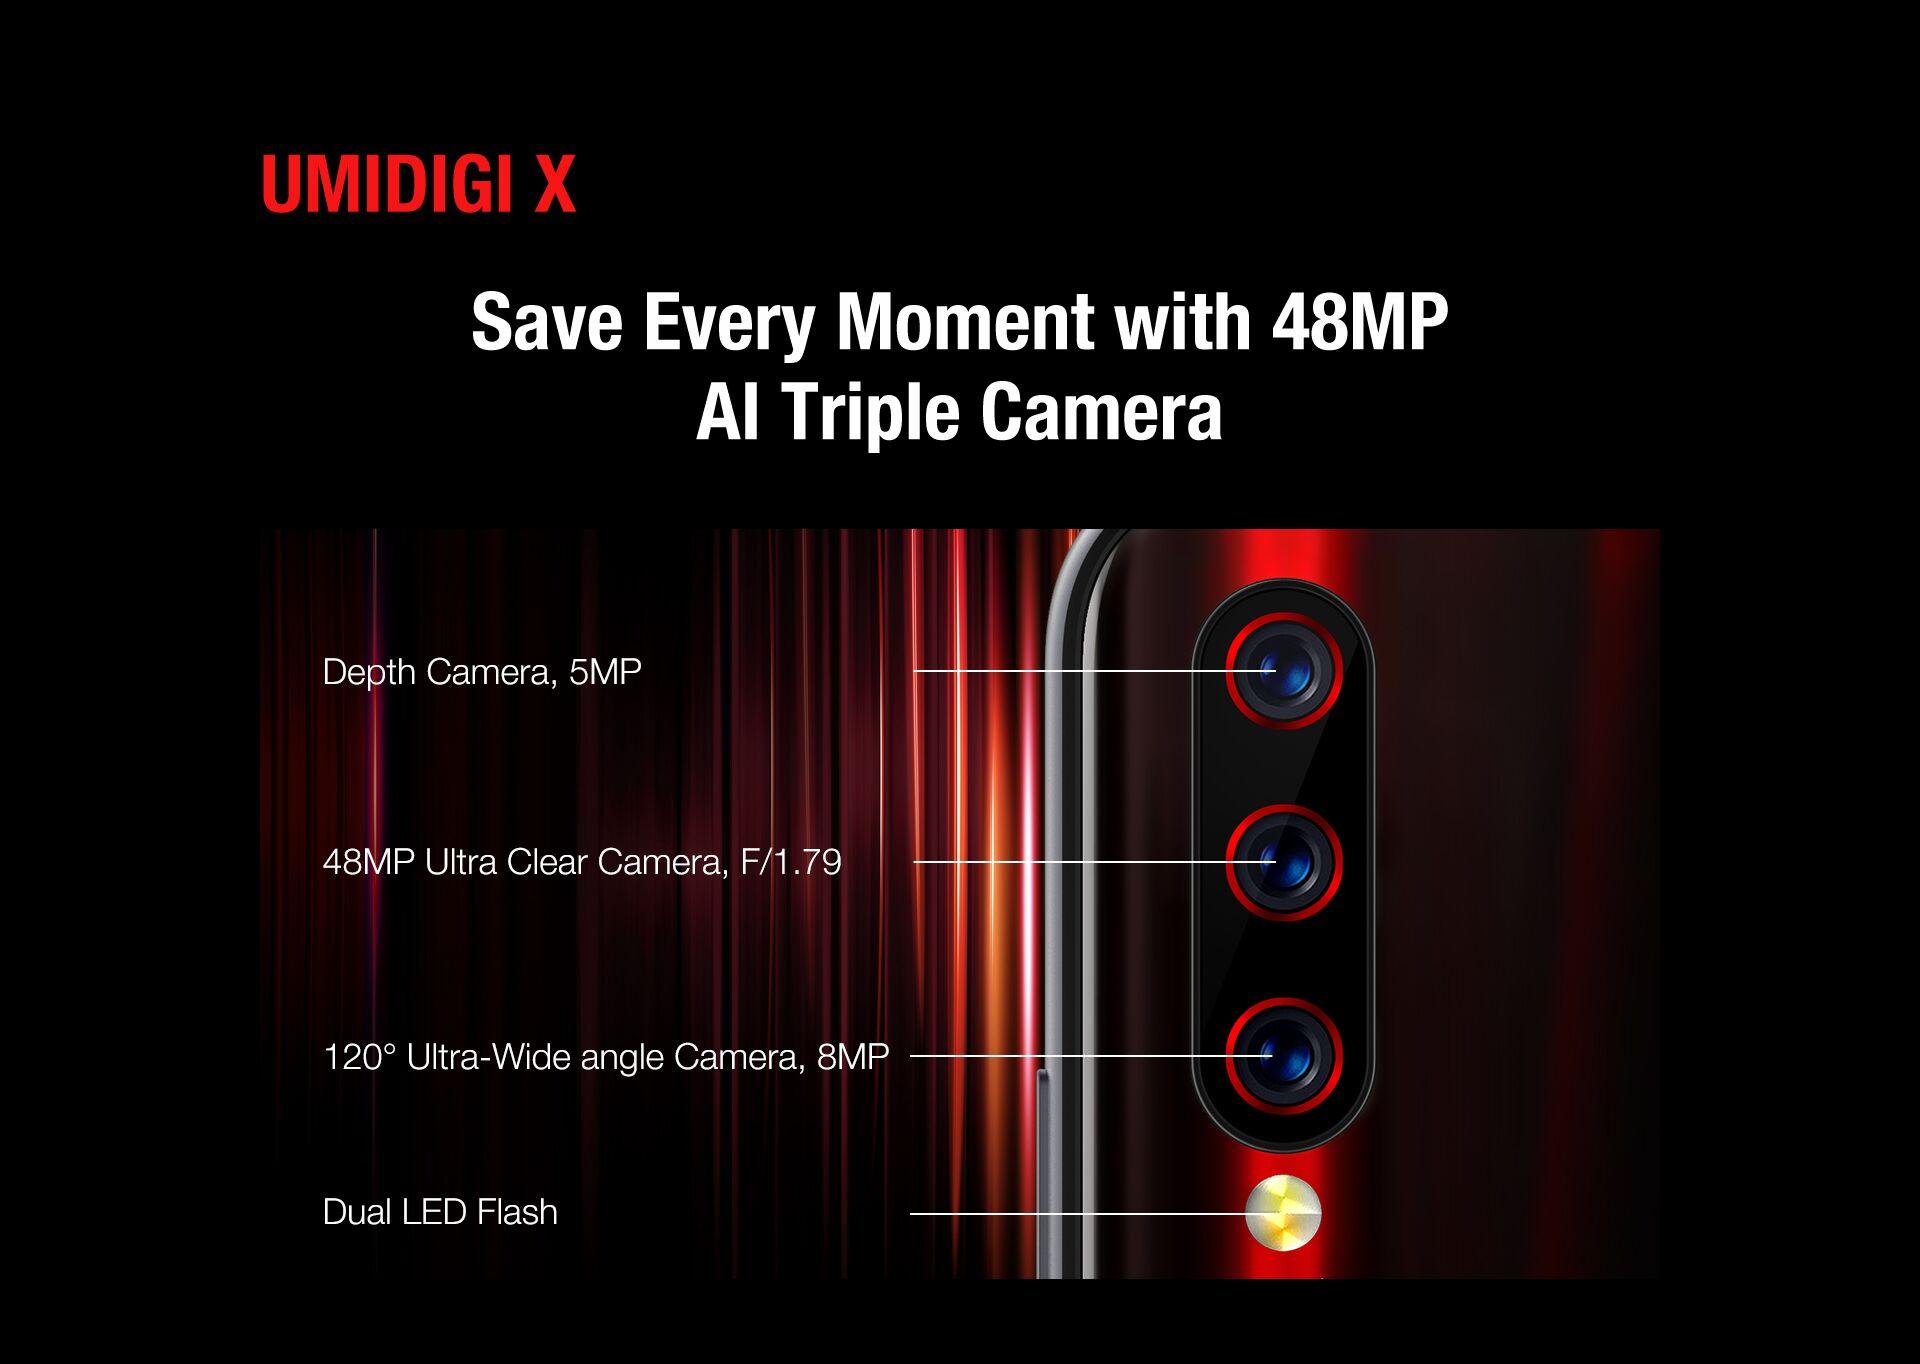 UMIDIGI X スペック詳細 背面カメラは48MPメインセンサーの超広角レンズ付きトリプルレンズ